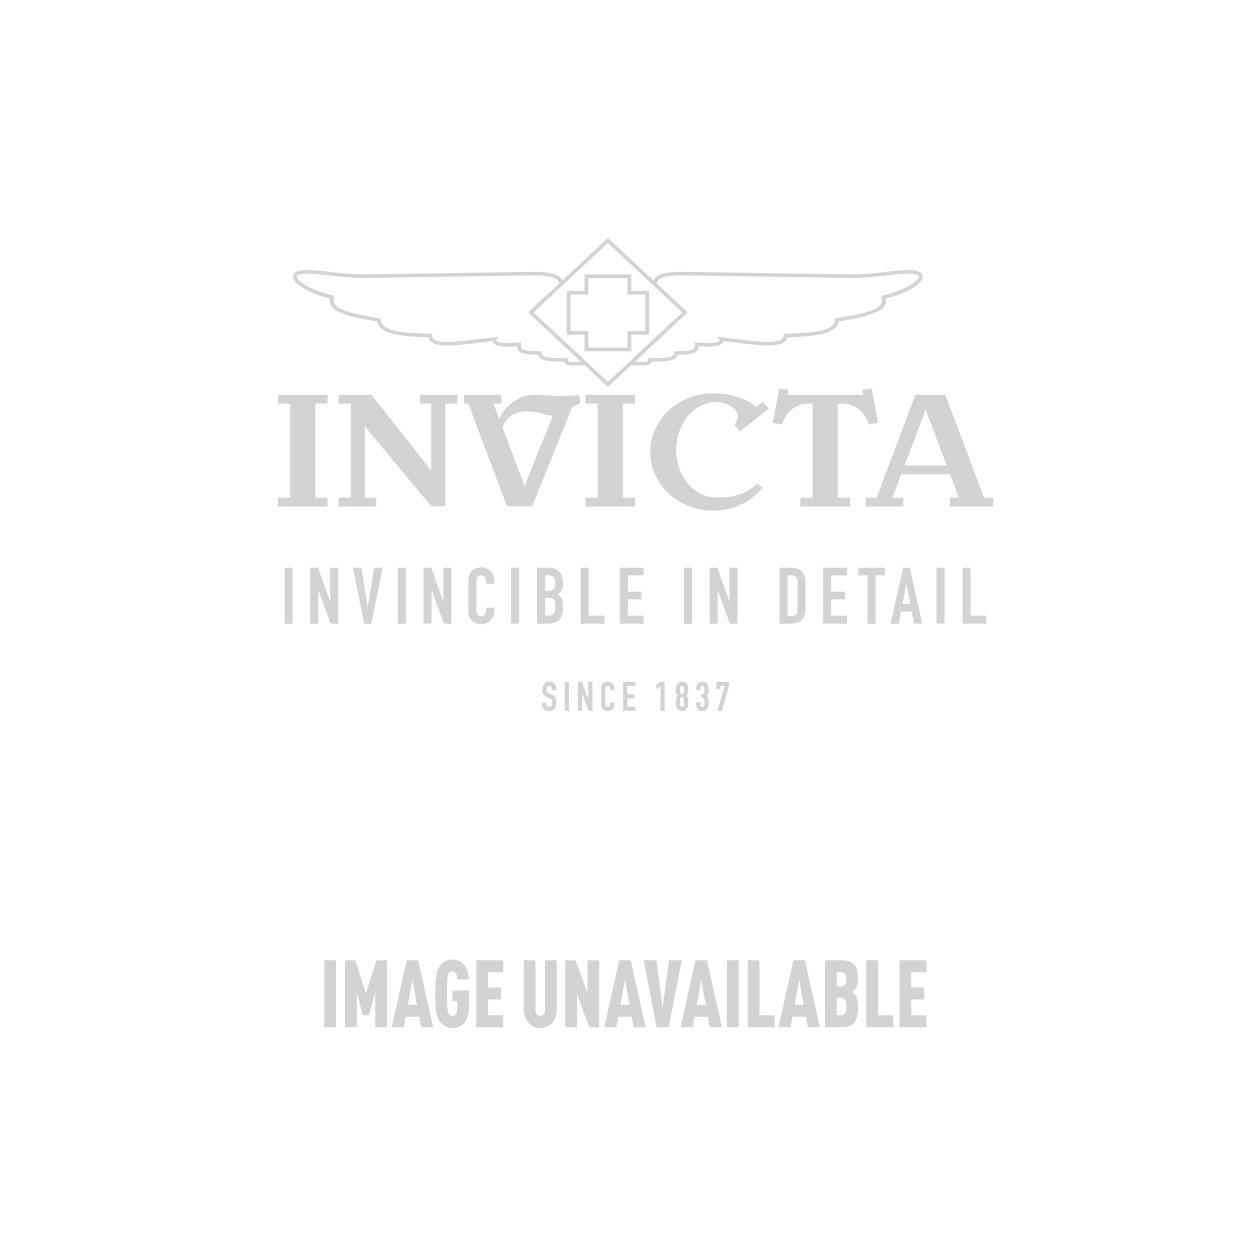 Invicta Venom Swiss Made Quartz Watch - Stainless Steel case Stainless Steel band - Model 1537